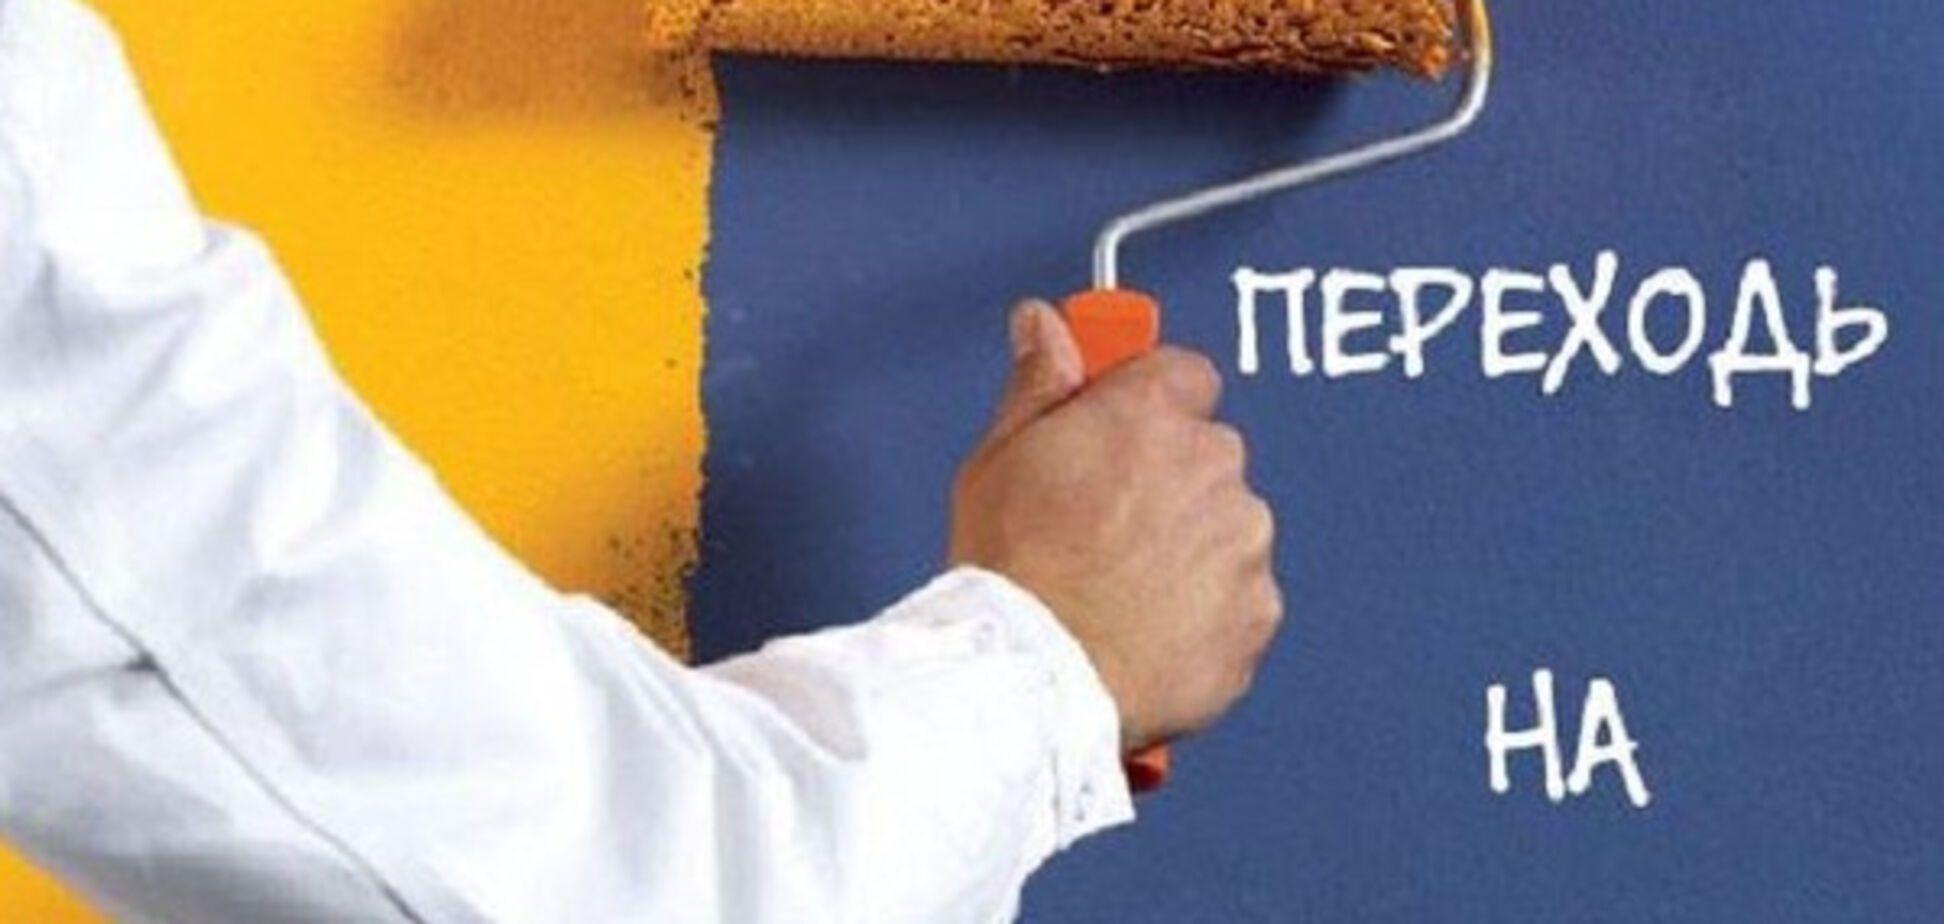 Переходь на українську